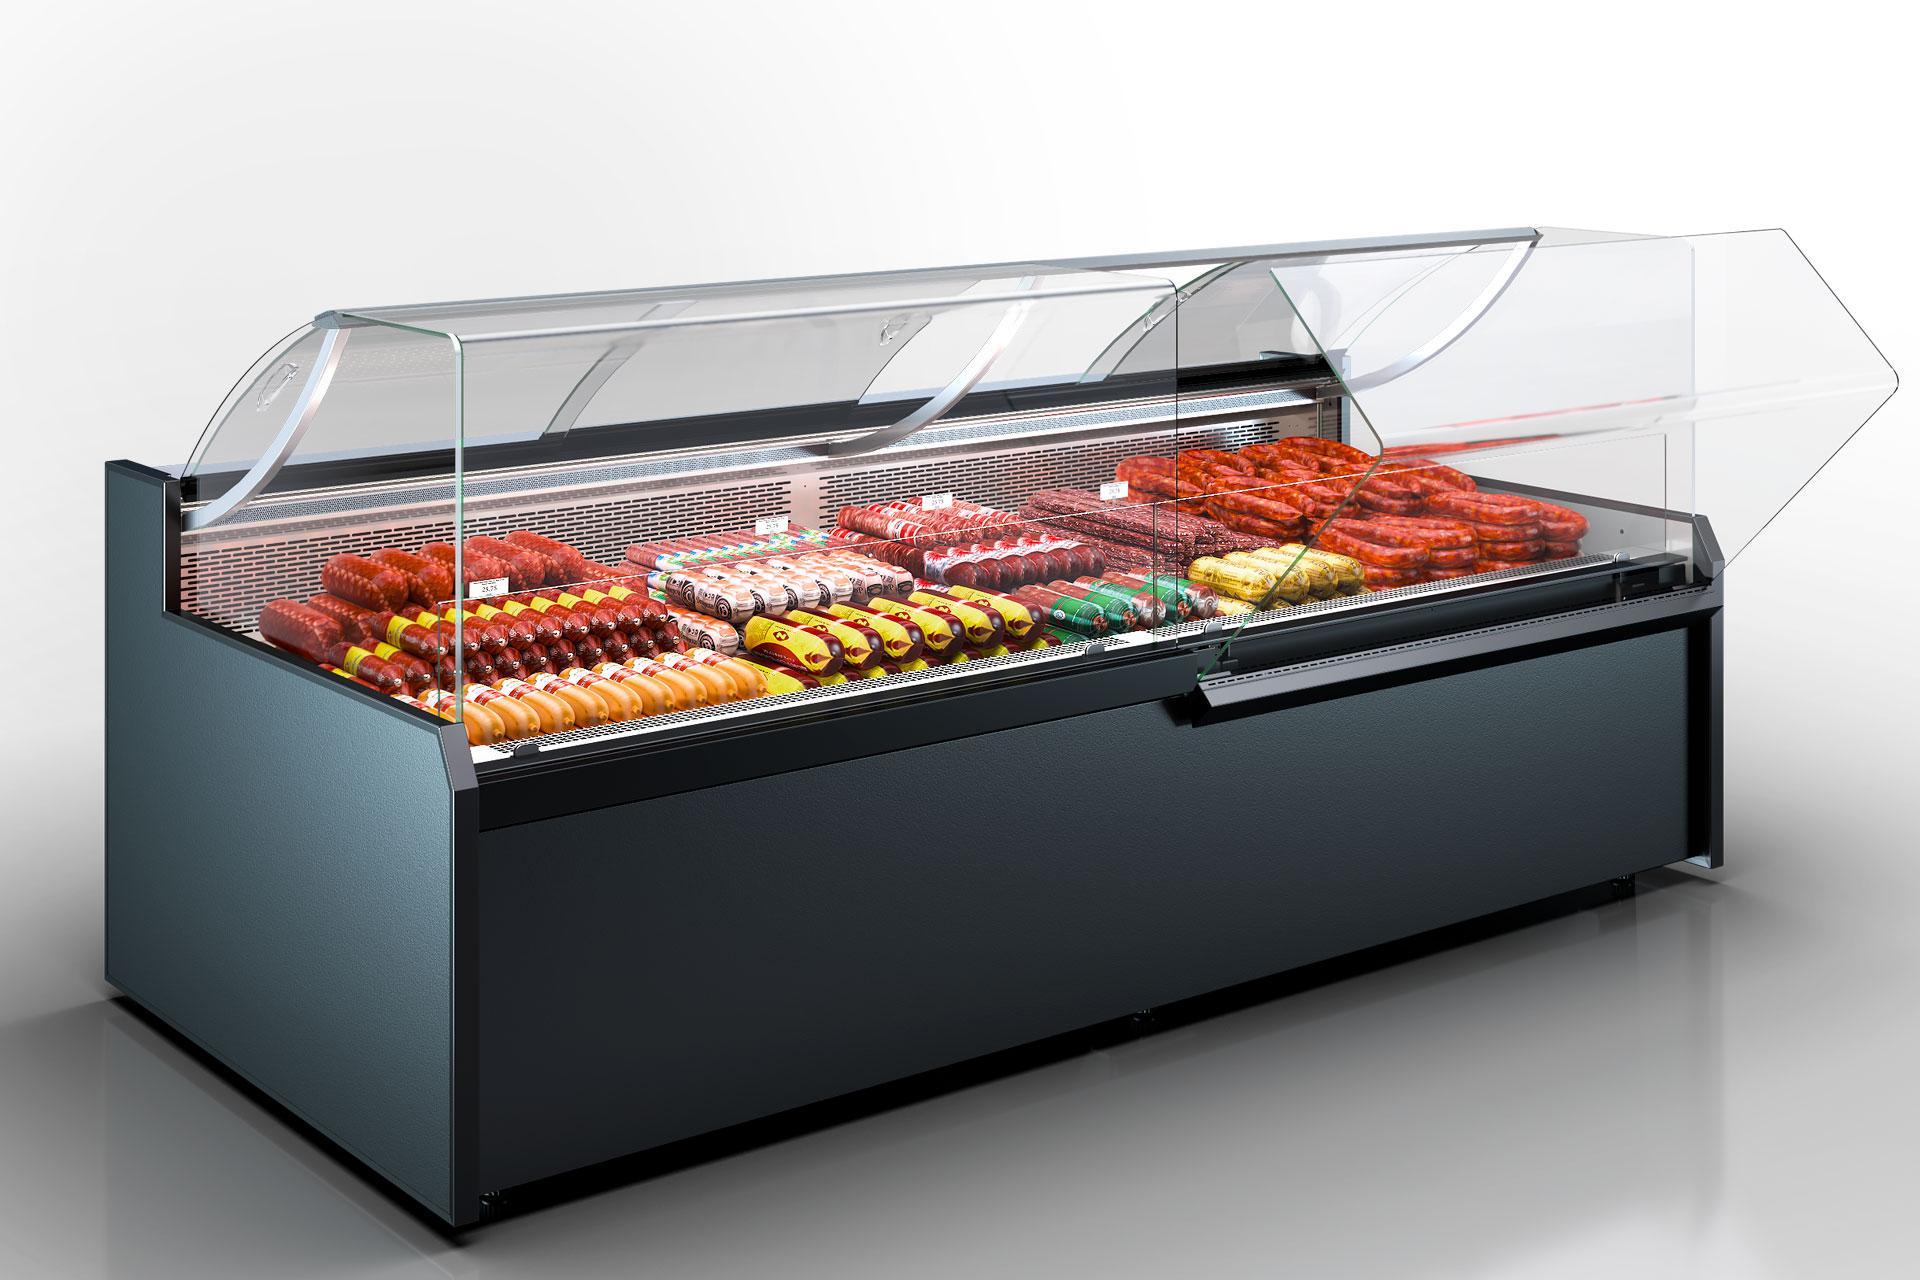 Refrigerating counters Missouri MC 120 deli OS 120-DBM (option)